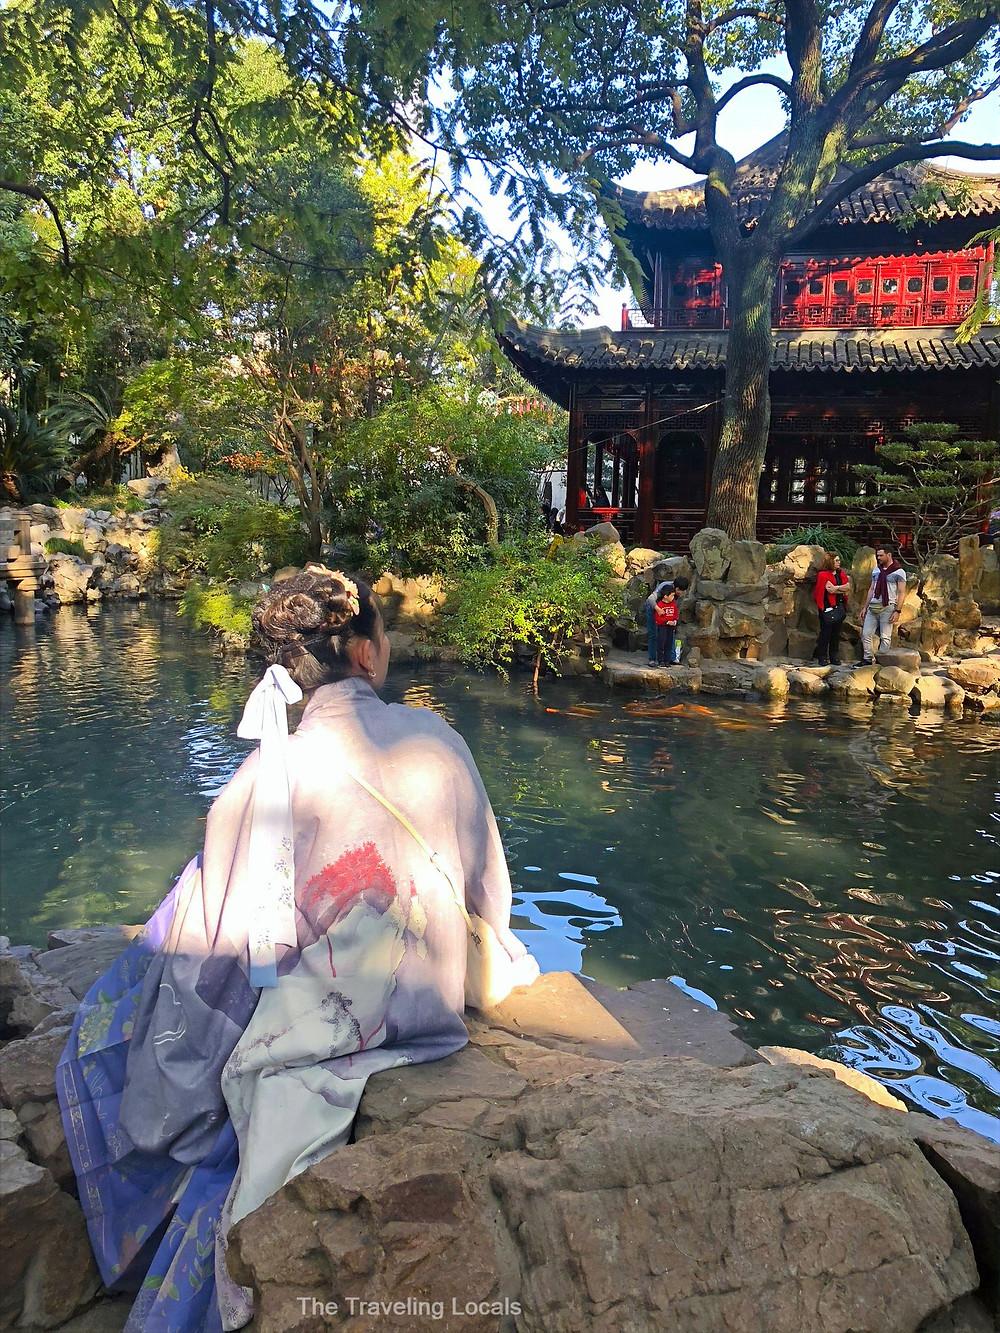 Photoshoot in Yu Garden Shanghai China, The Traveling Locals